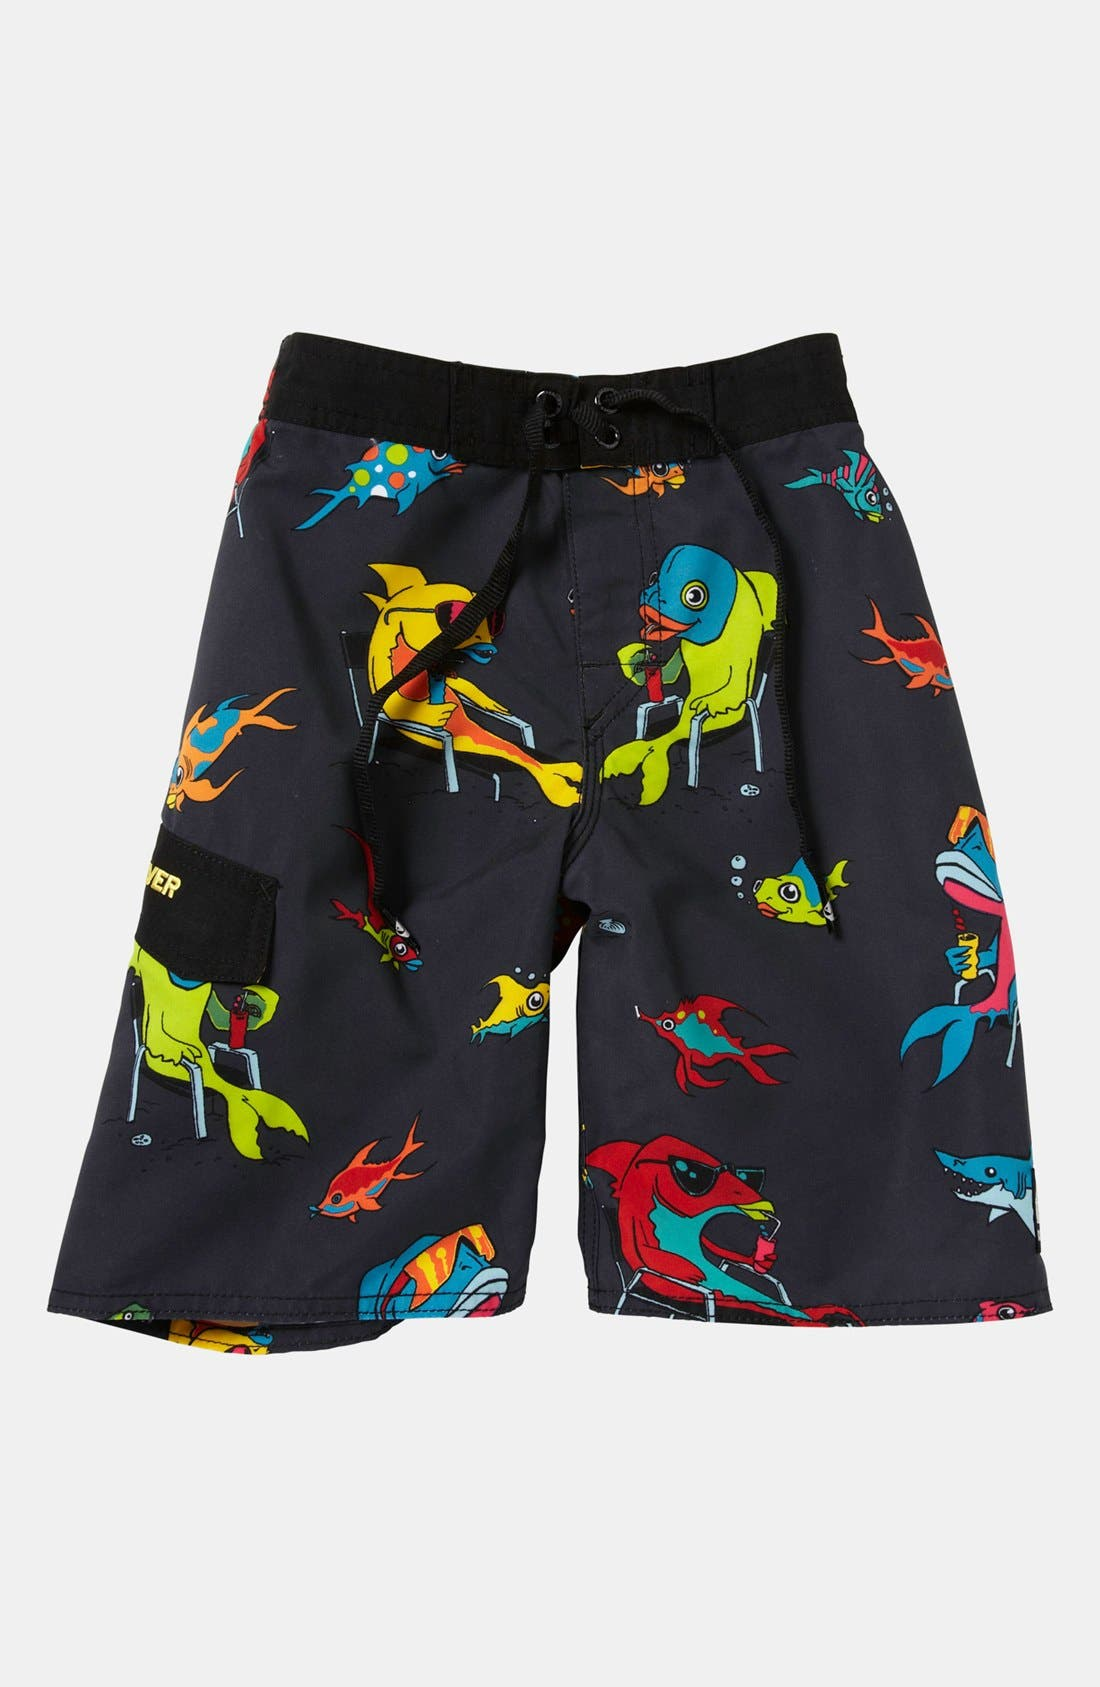 Main Image - Quiksilver 'Fish Tacoz' Board Shorts (Little Boys)